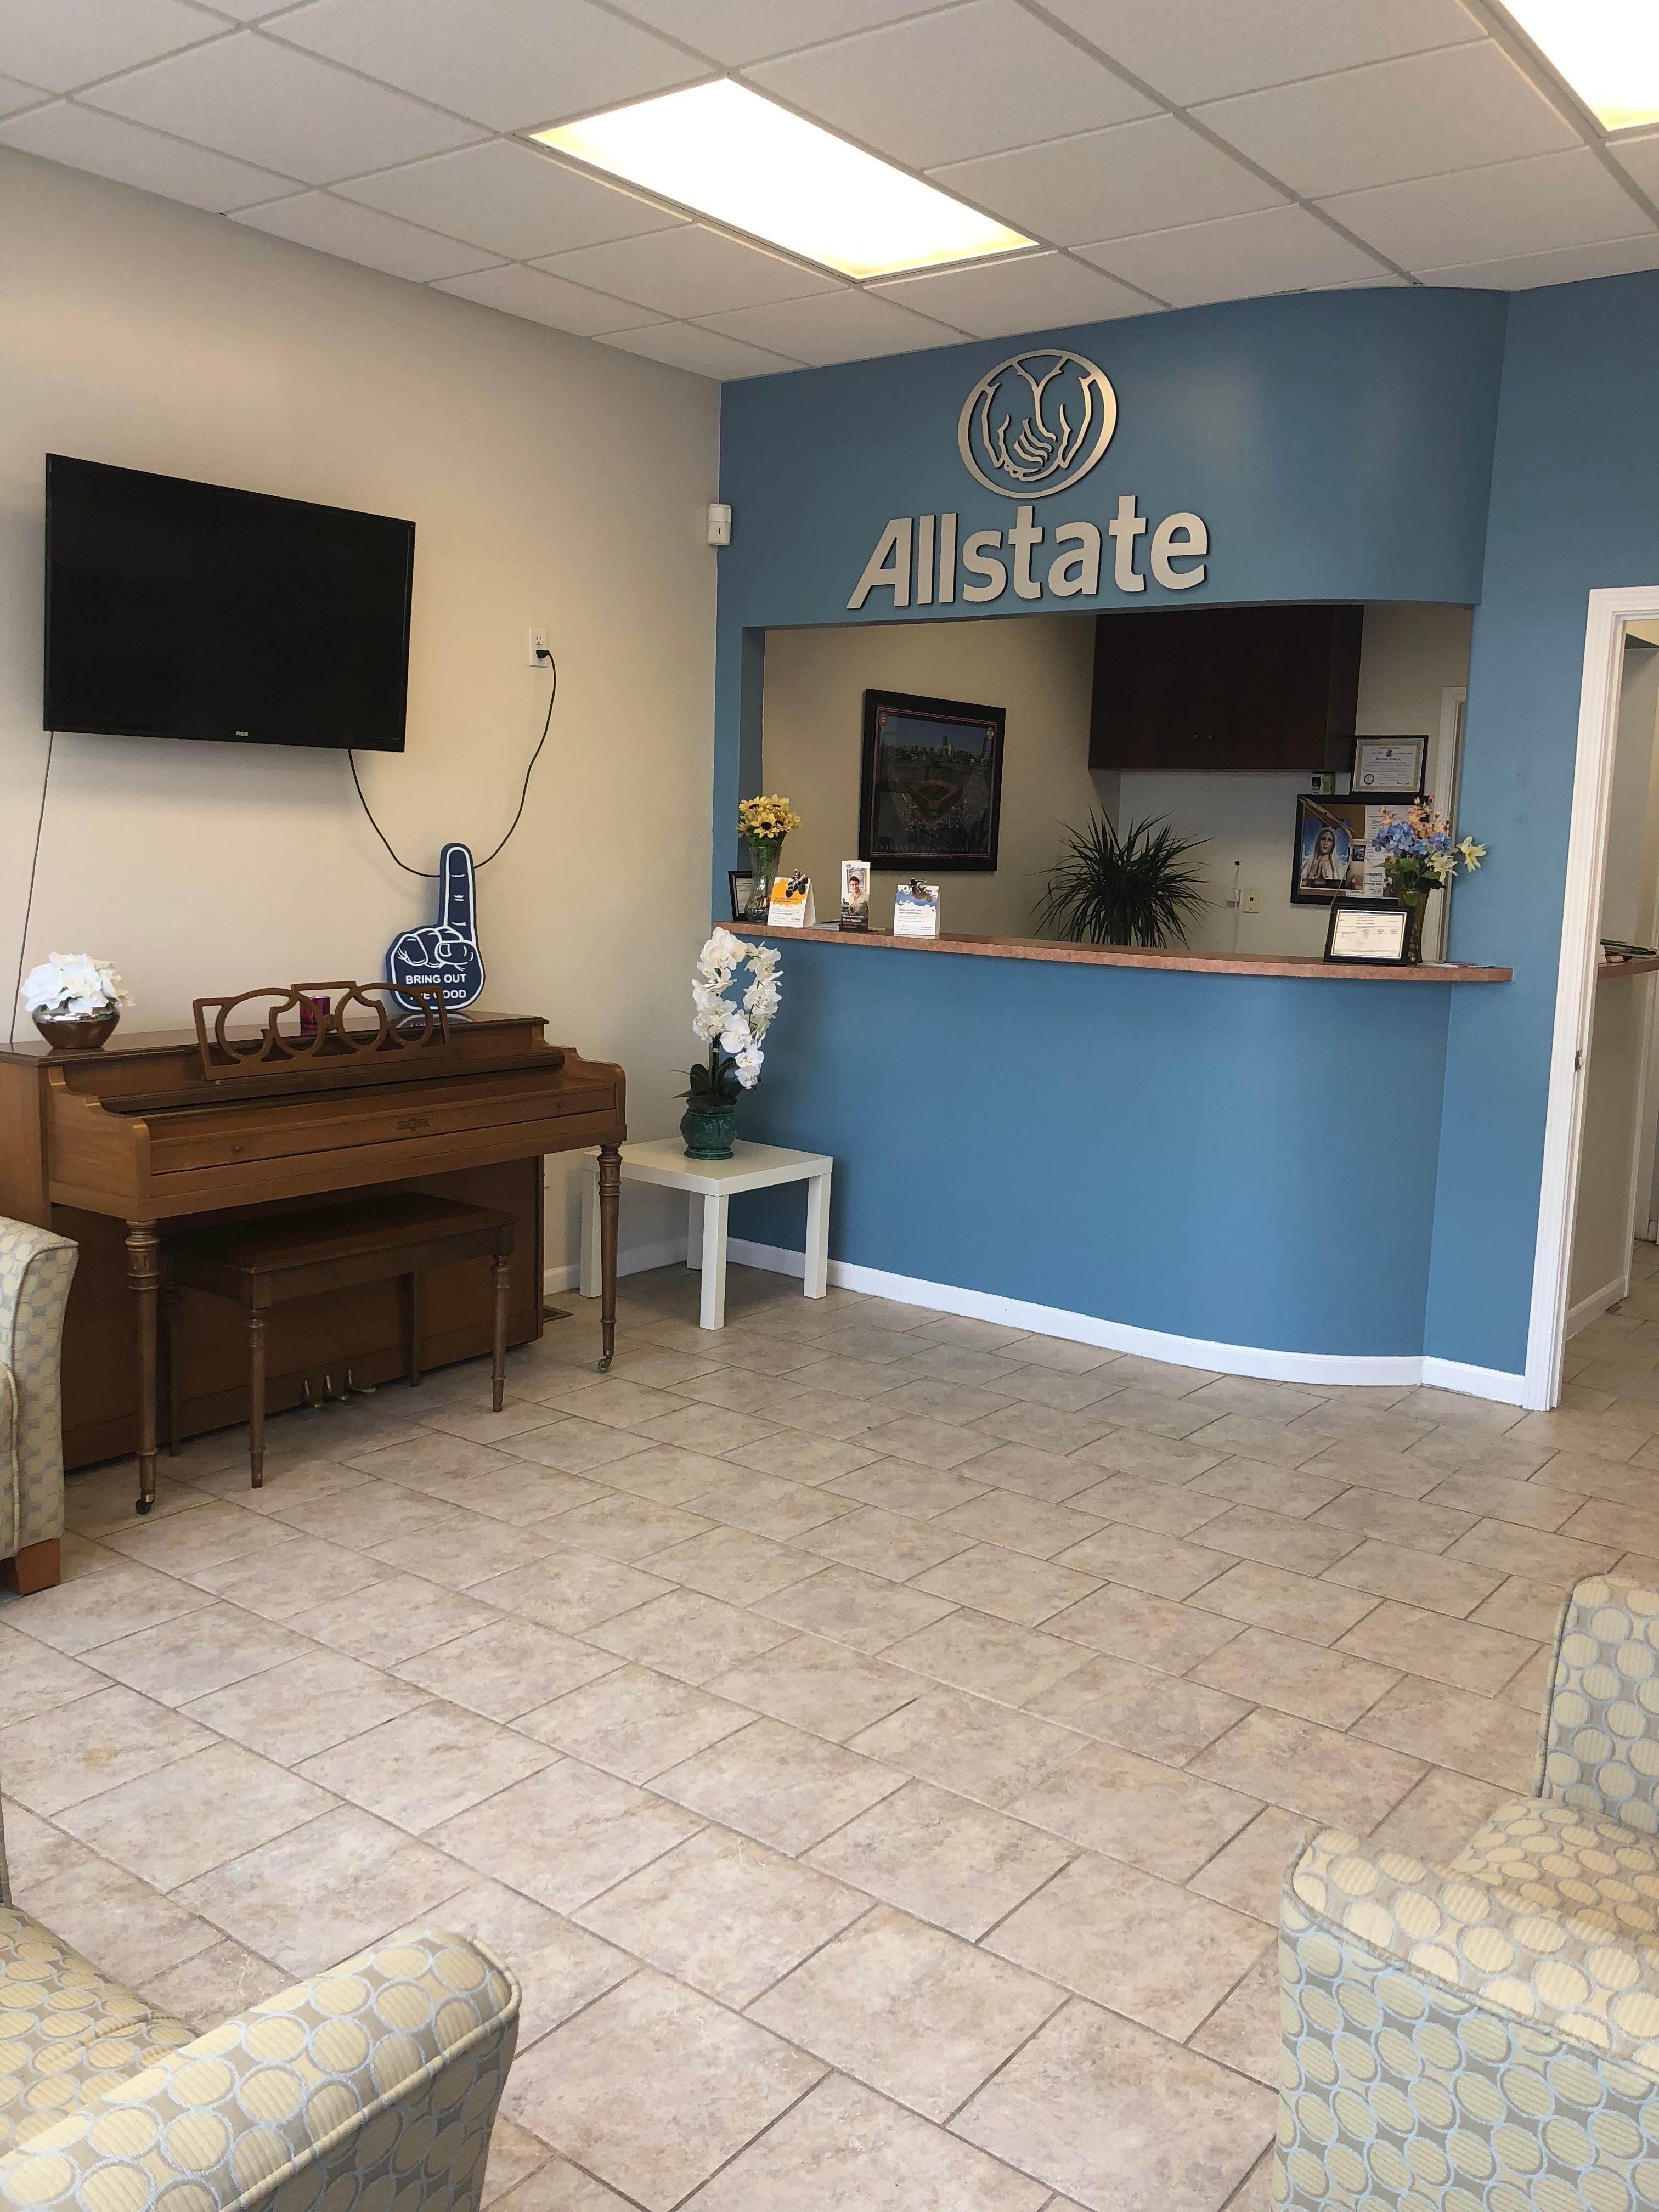 Raul Gomez: Allstate Insurance